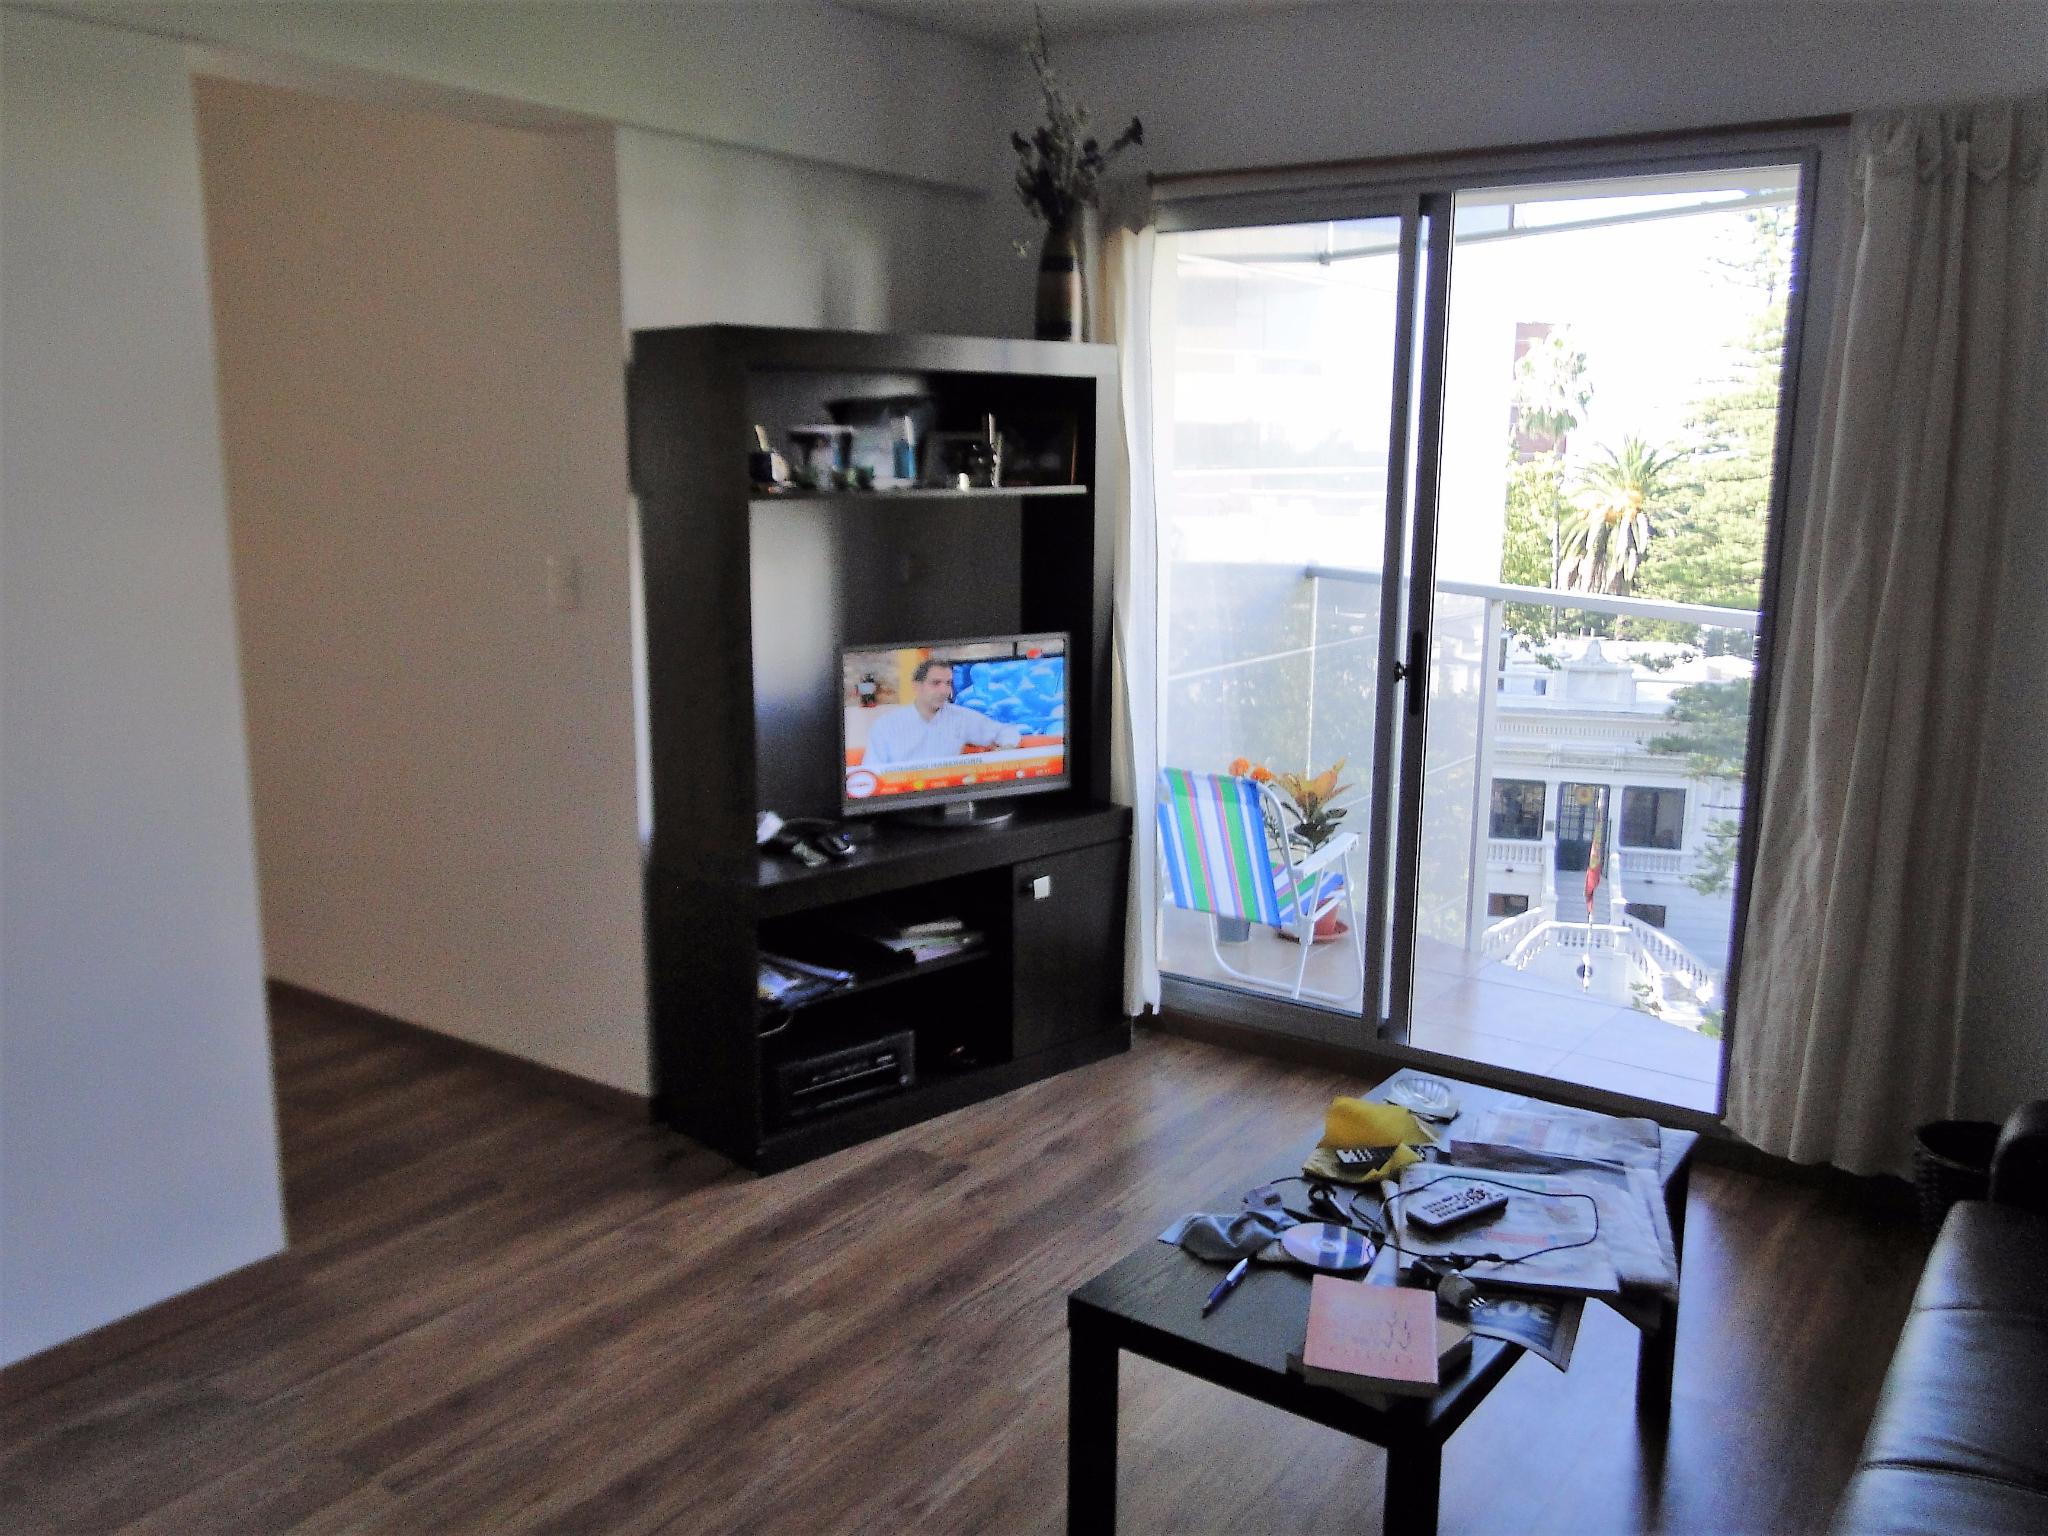 Venta apartamento Pocitos 2 dormitorios